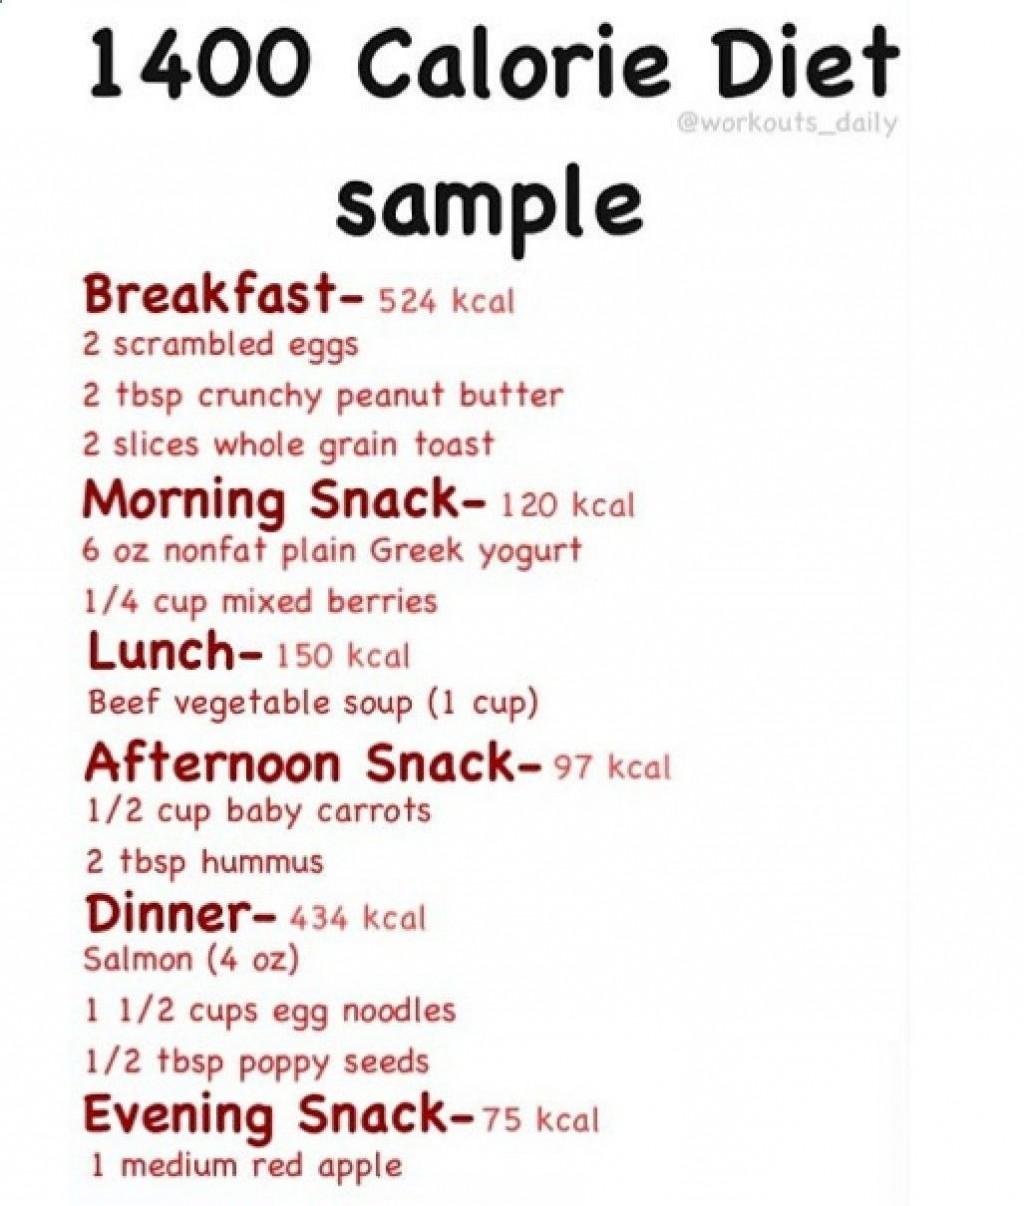 006 Unbelievable Sample 1500 Calorie Meal Plan Pdf Example Large